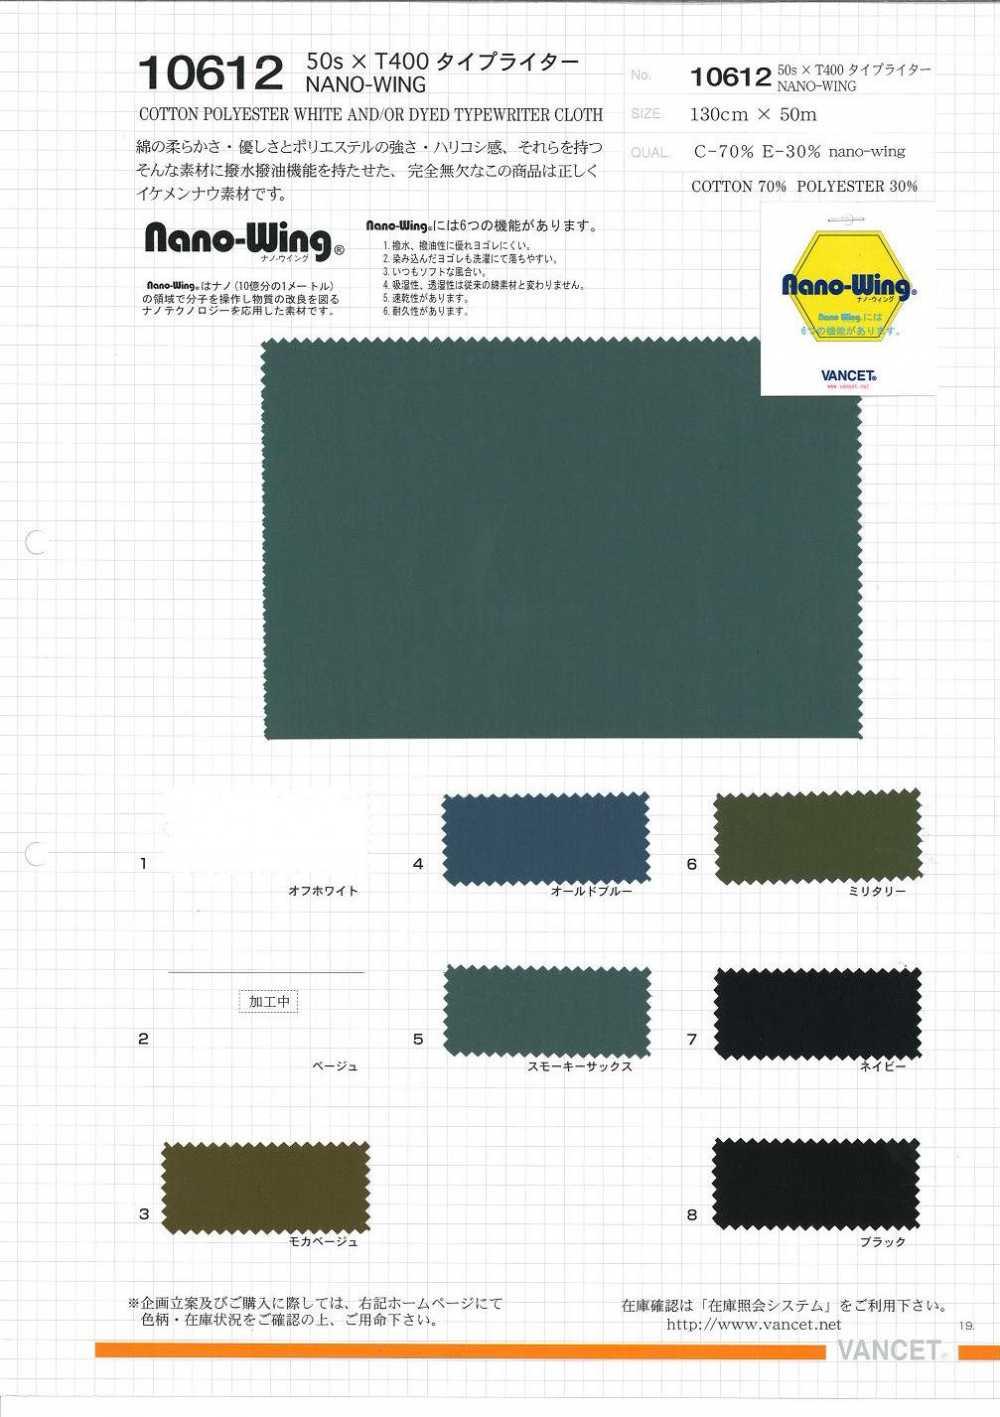 10612 50s × T400 タイプライター NANO-WING[生地] VANCET/オークラ商事 - ApparelX アパレル資材卸通販